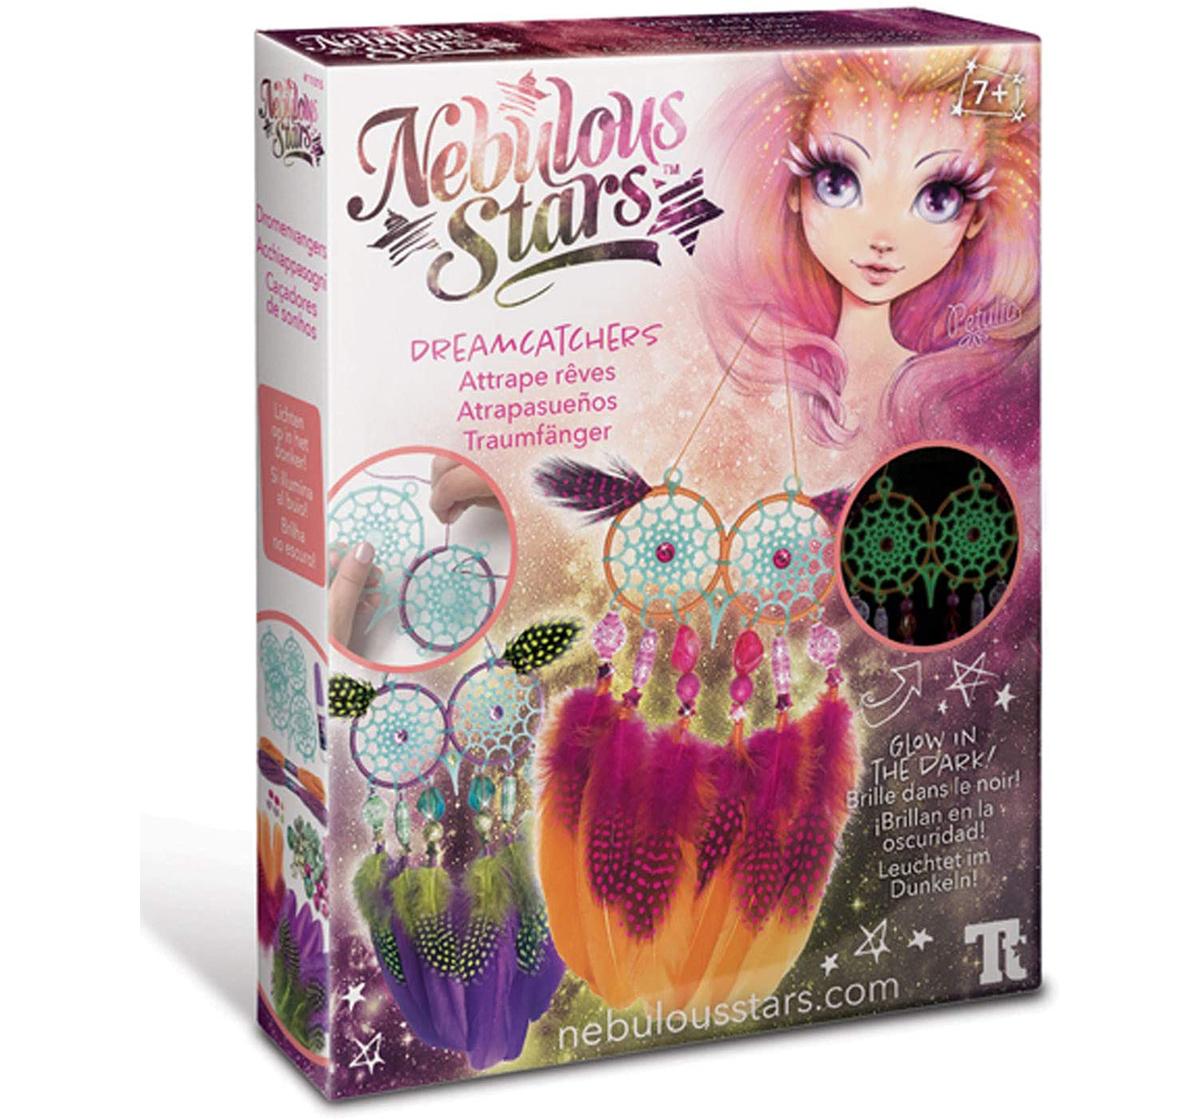 Nebulous Star | Nebulous Star - Dreamcatchers DIY Art & Craft Kits for Girls age 7Y+